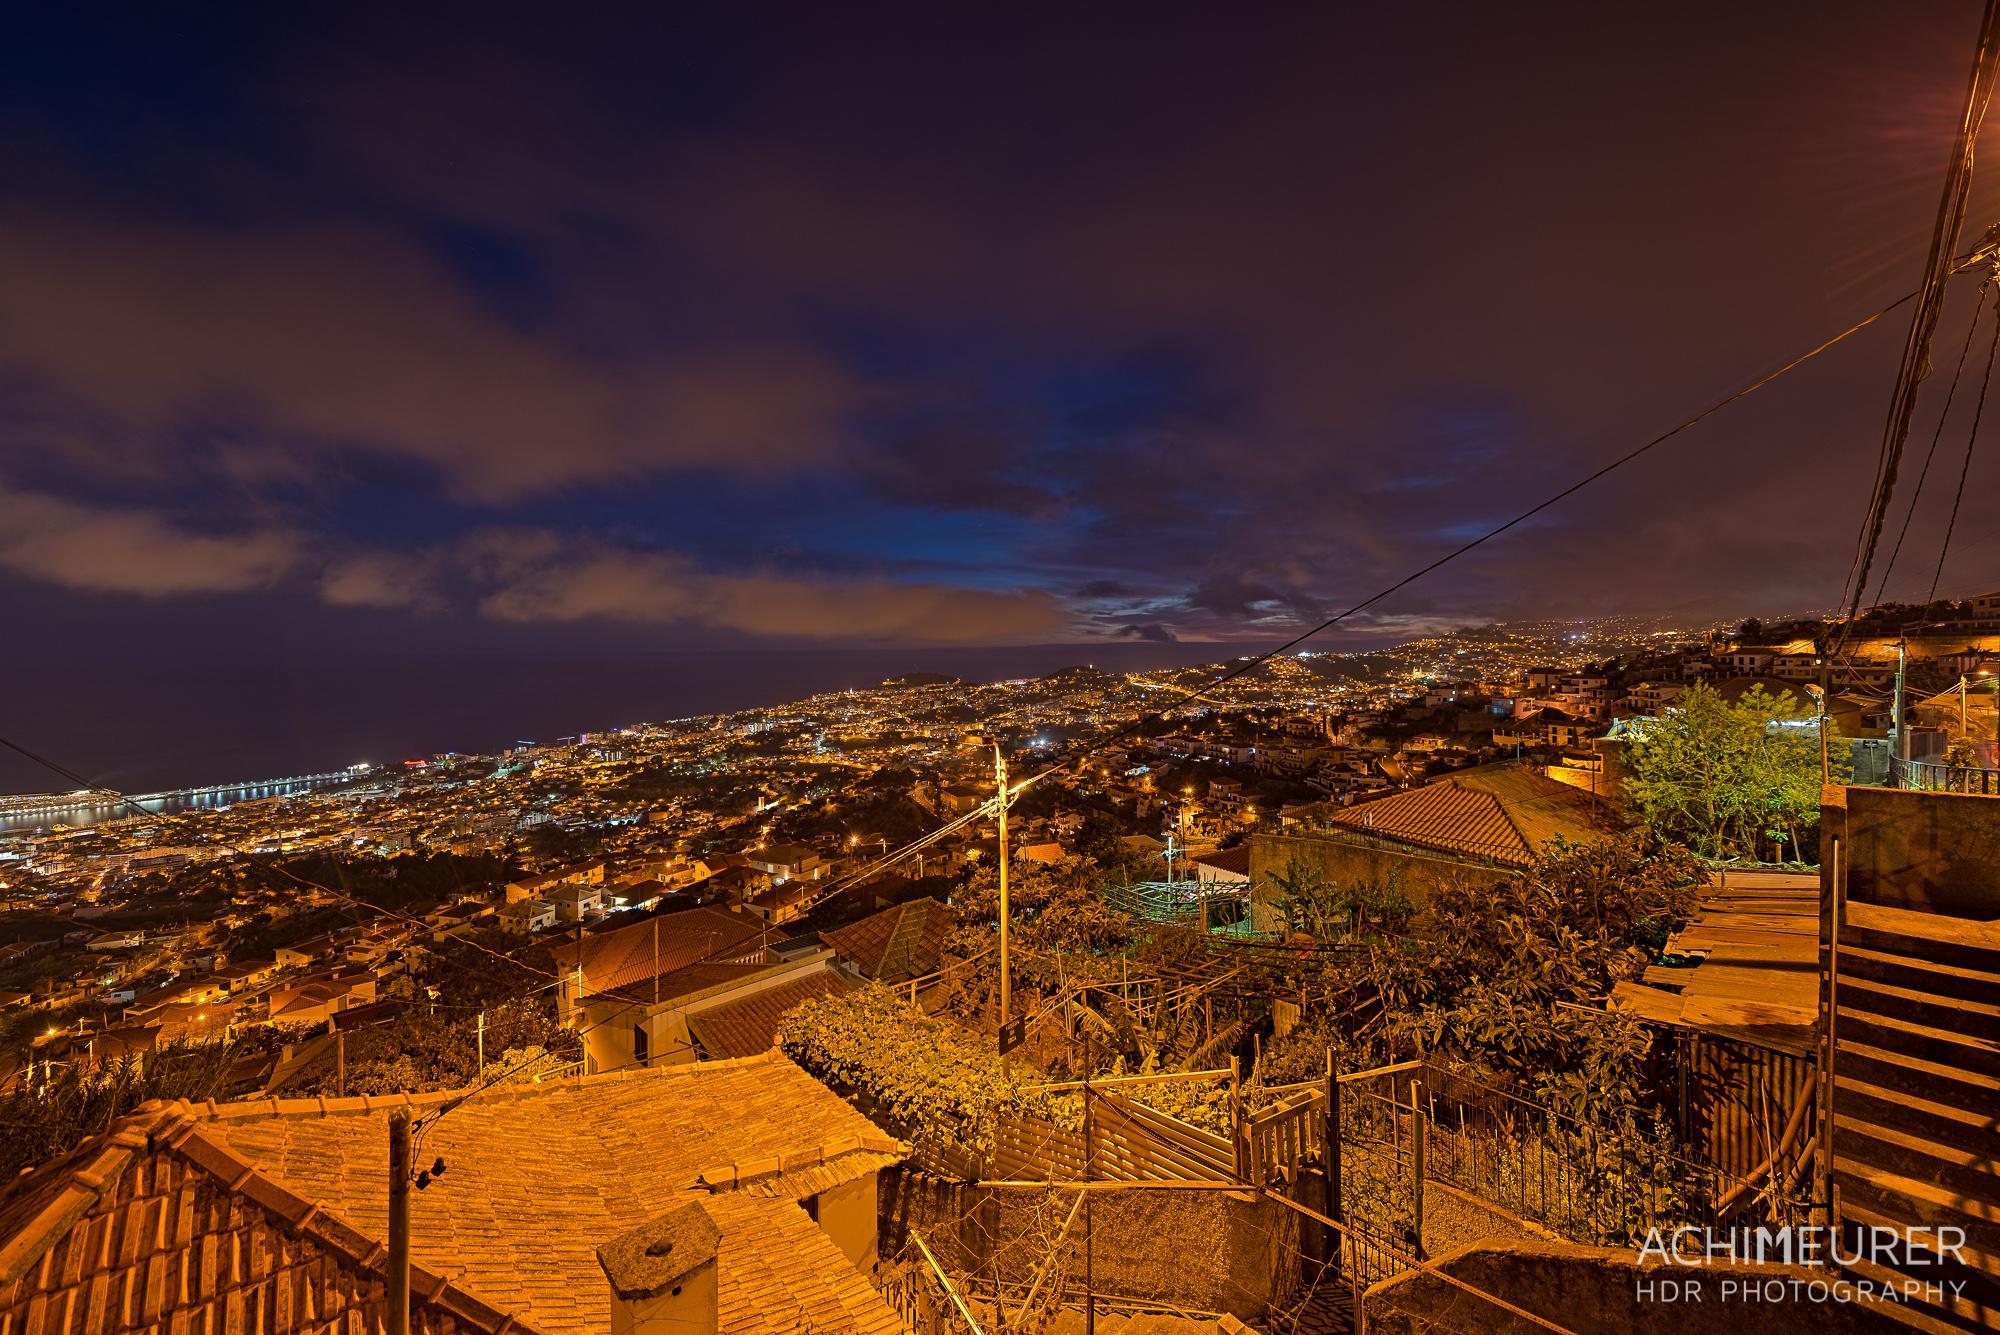 Madeira_6605_4_3_2_1_HDR-Bearbeitet